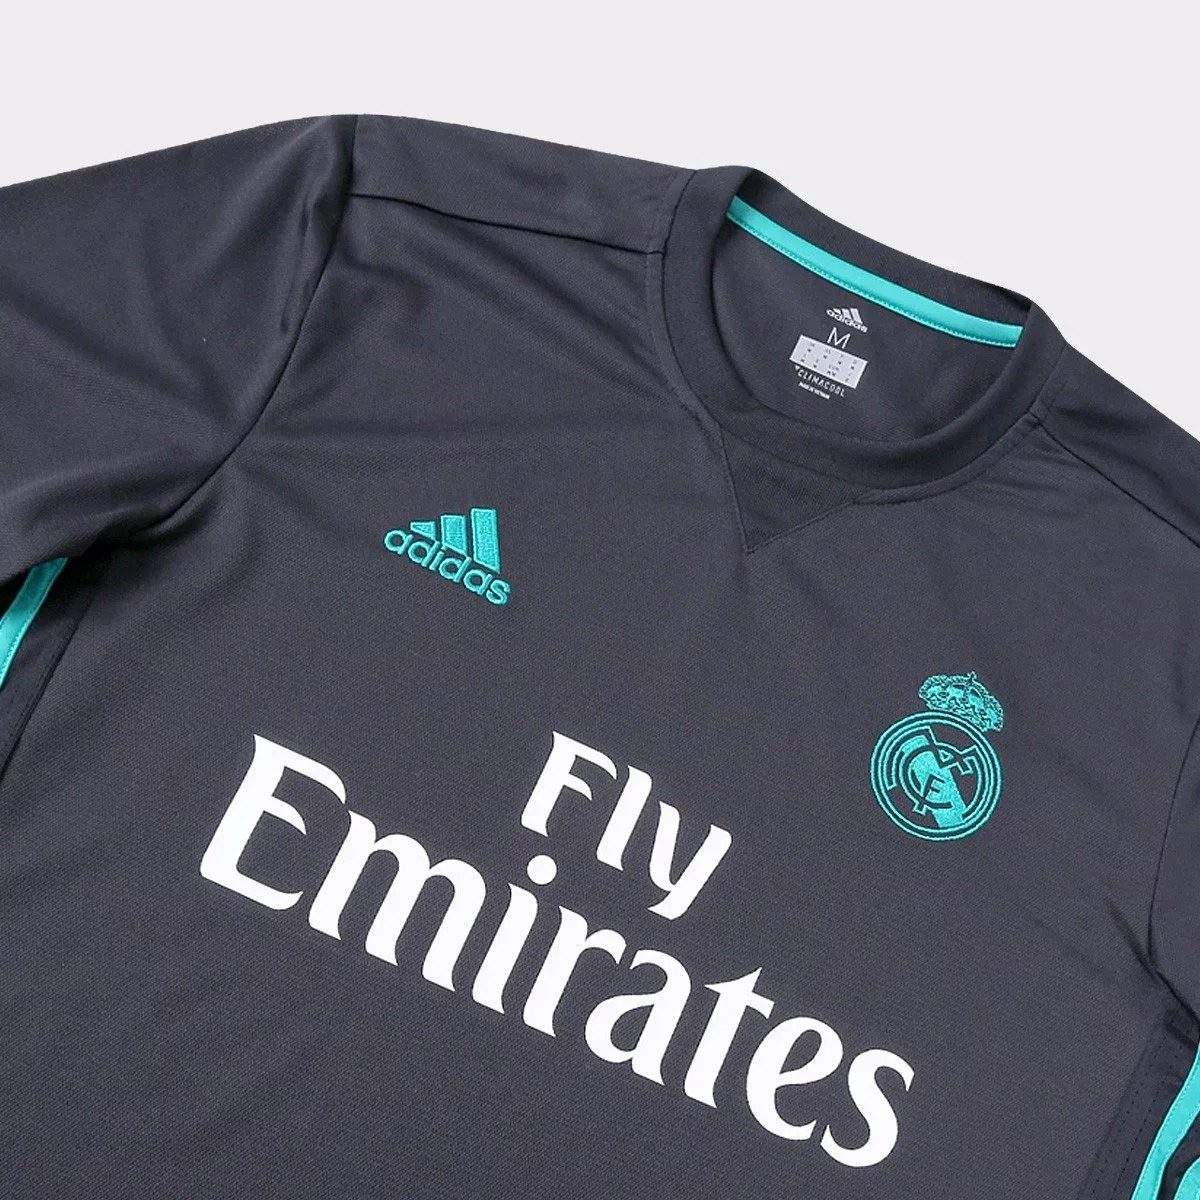 49003ff173ac2 camiseta real madrid torcedor oficial champions 2018. Carregando zoom.